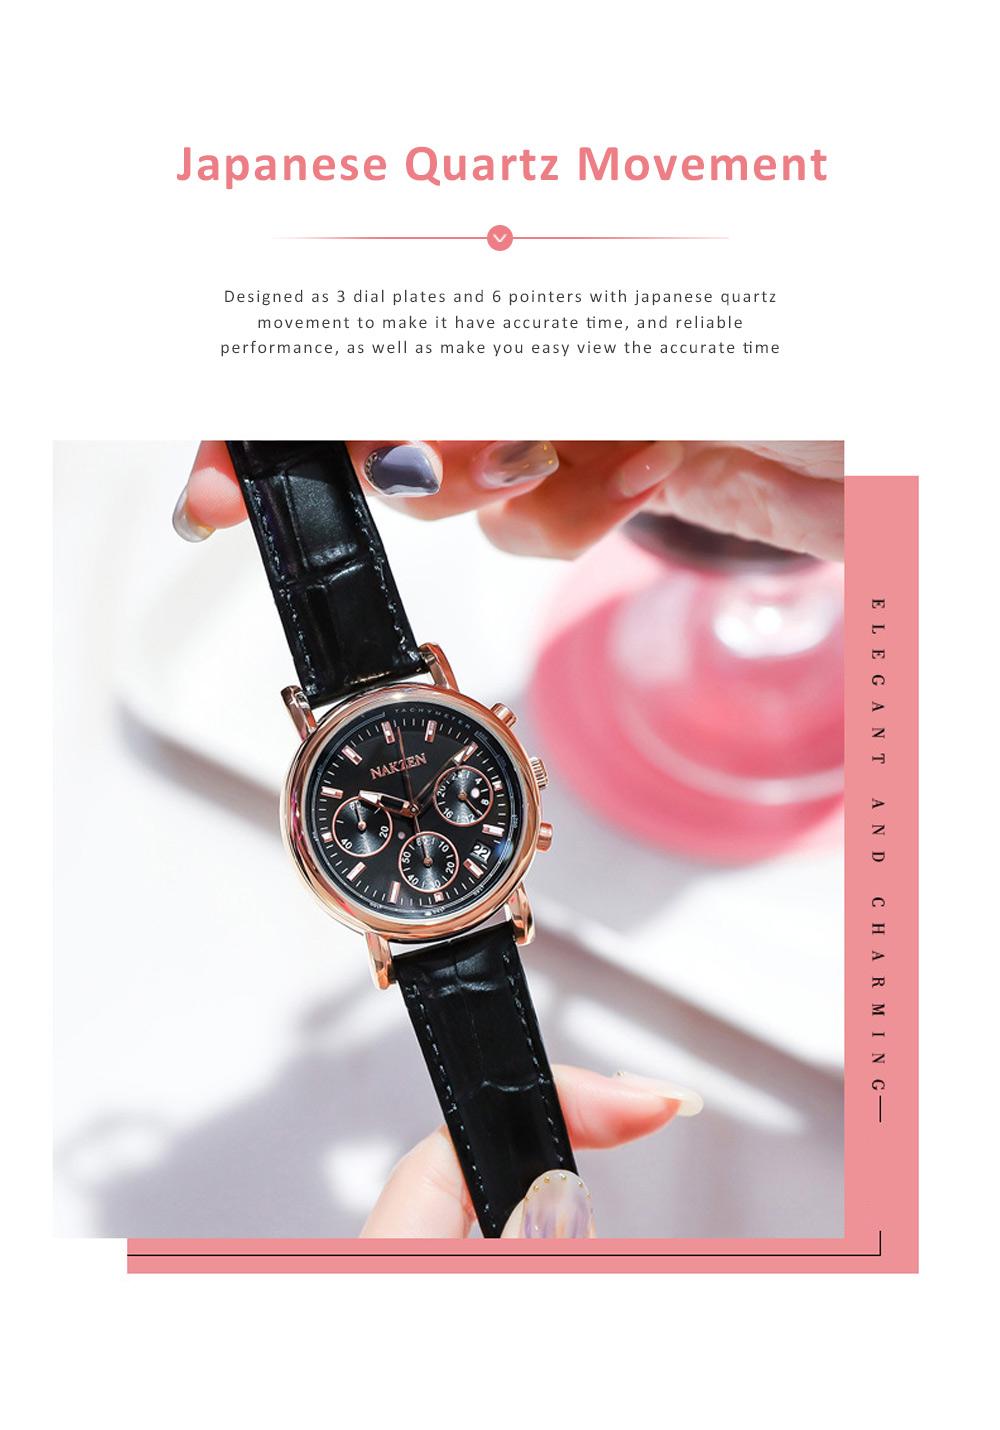 Fashion Women Watch Japanese Quartz Movement Wrist Watch with Calendar Genuine Leather Watch Strap Quartz Watch 4